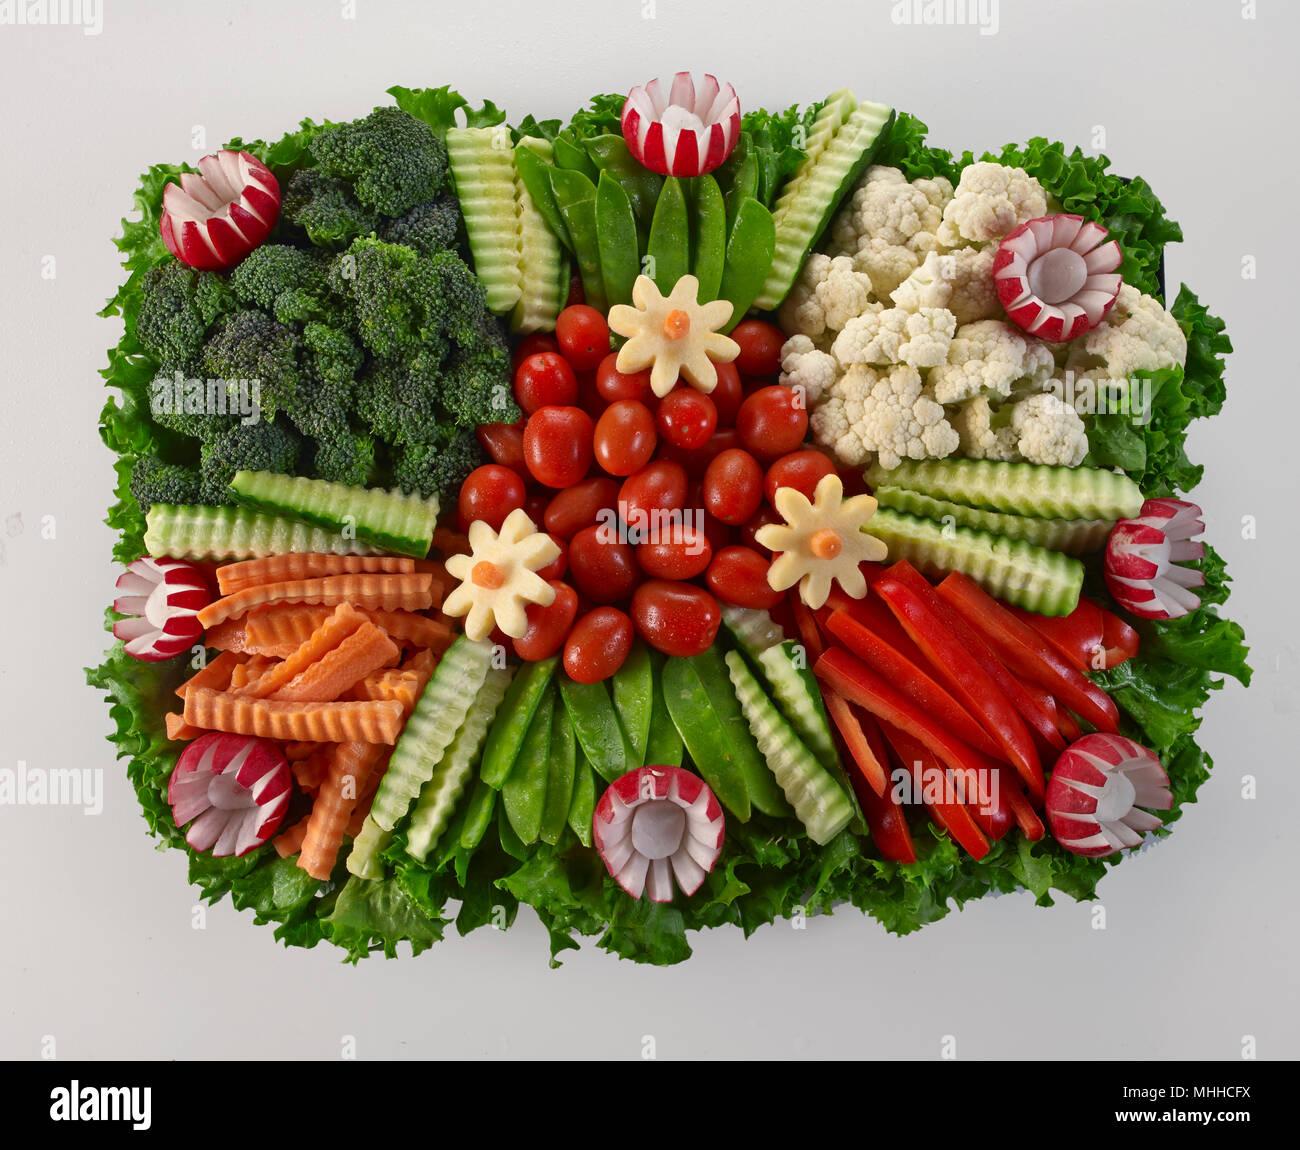 Raw Vegetable Platter Stock Photo Alamy